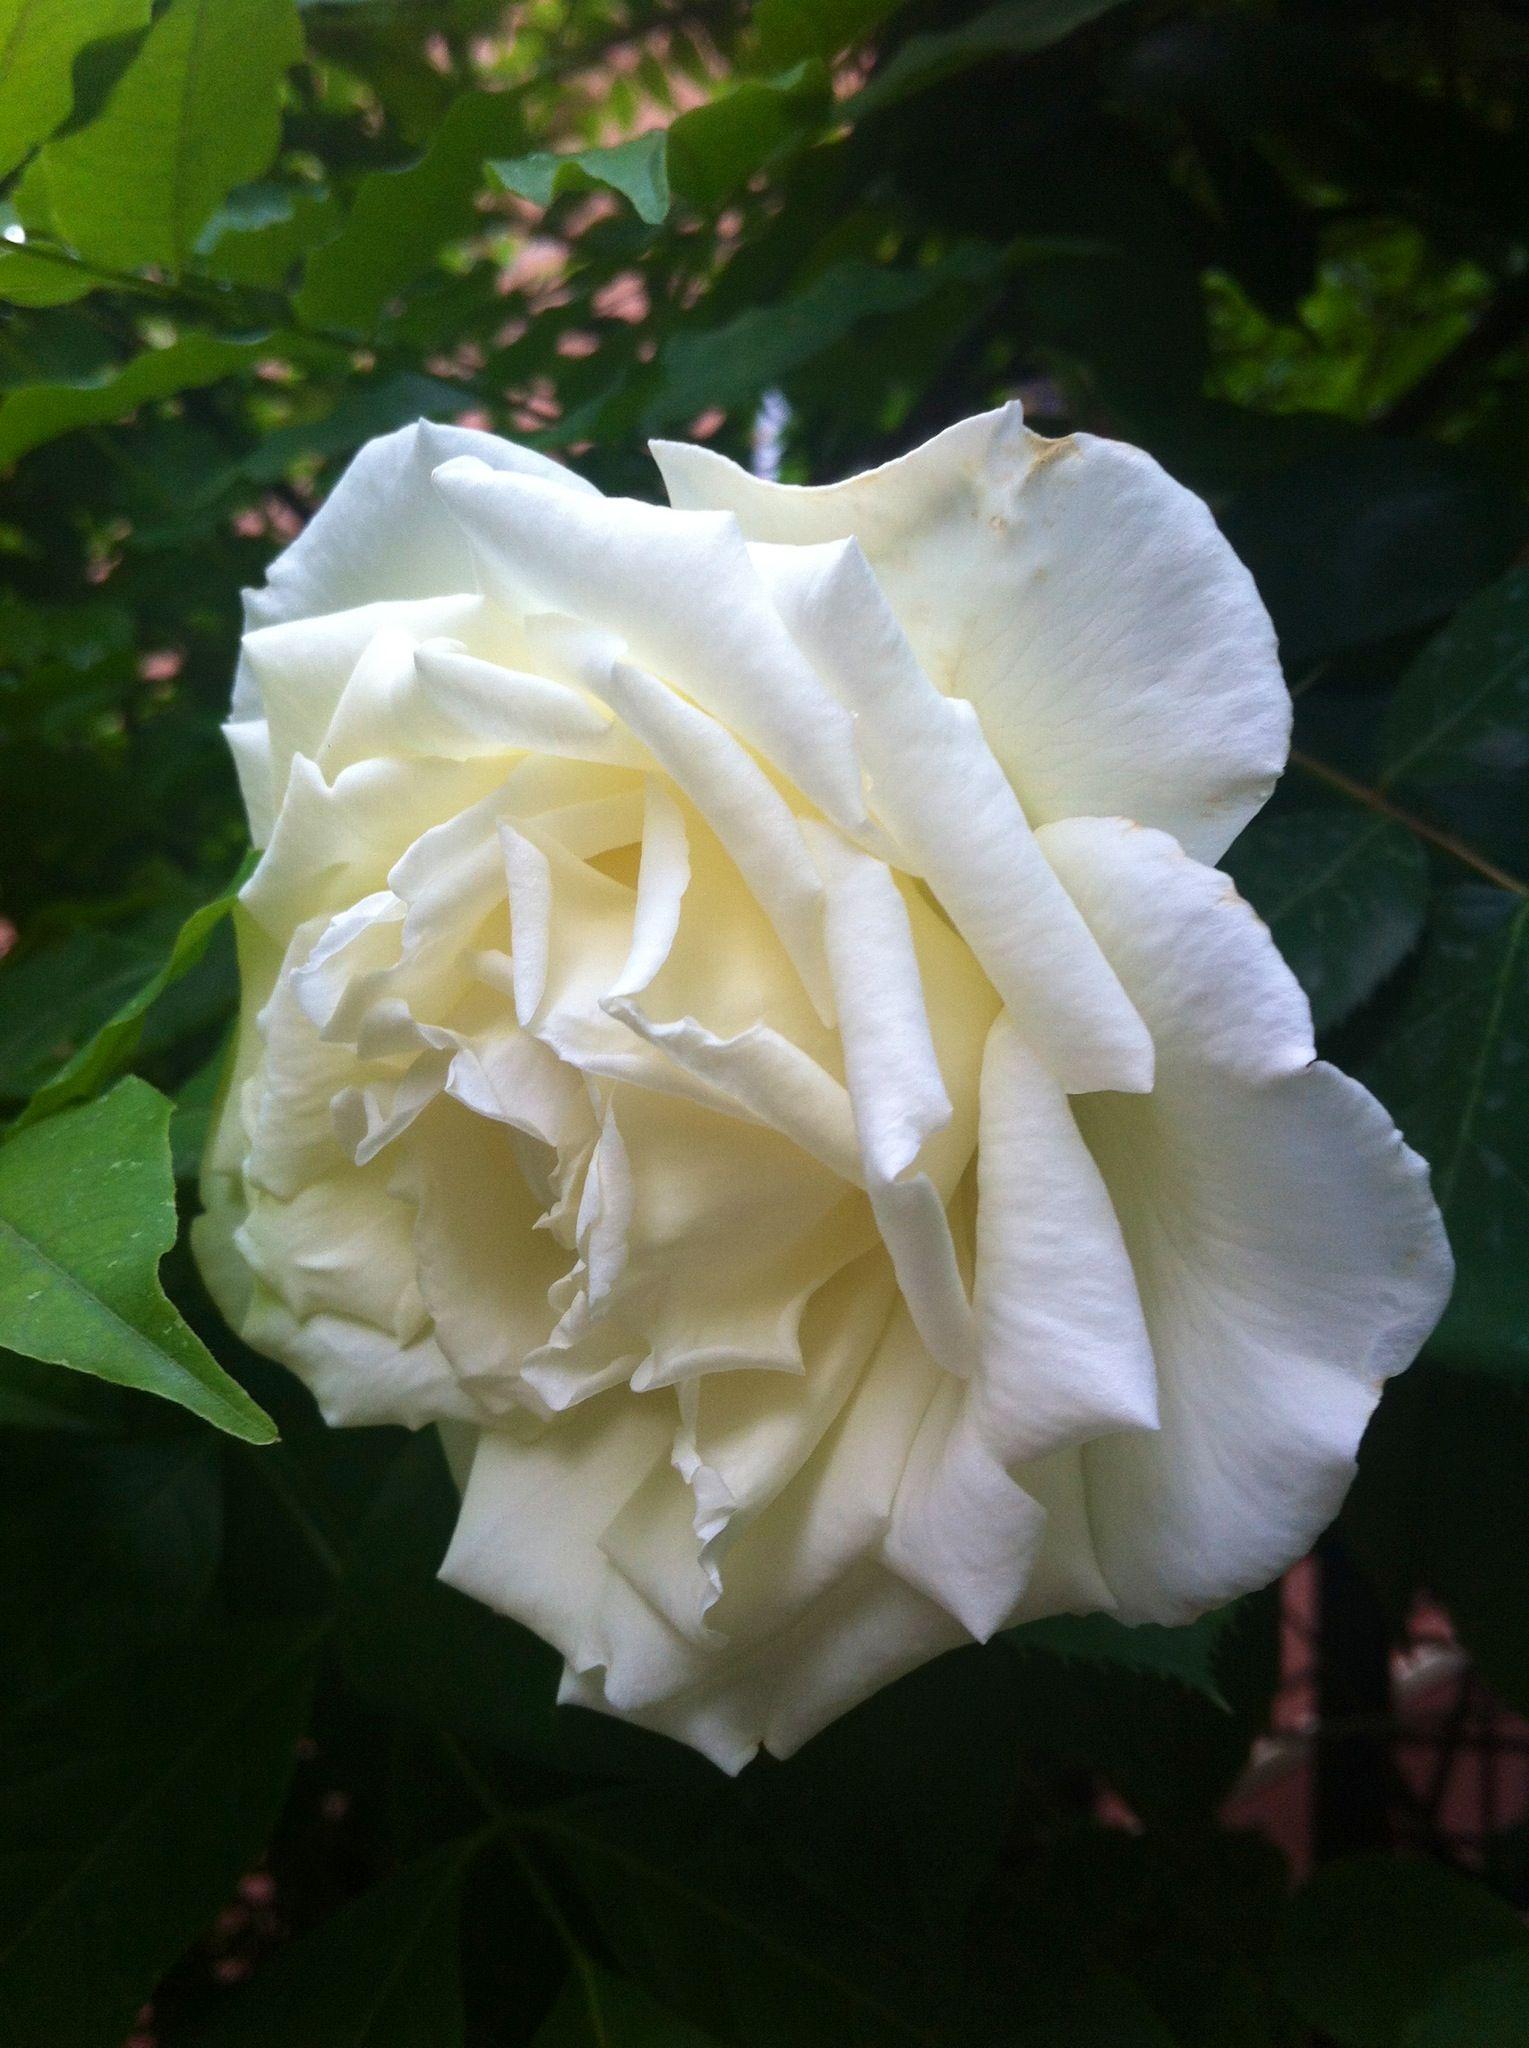 Rose of May,  Modena 16 Maggio 2013